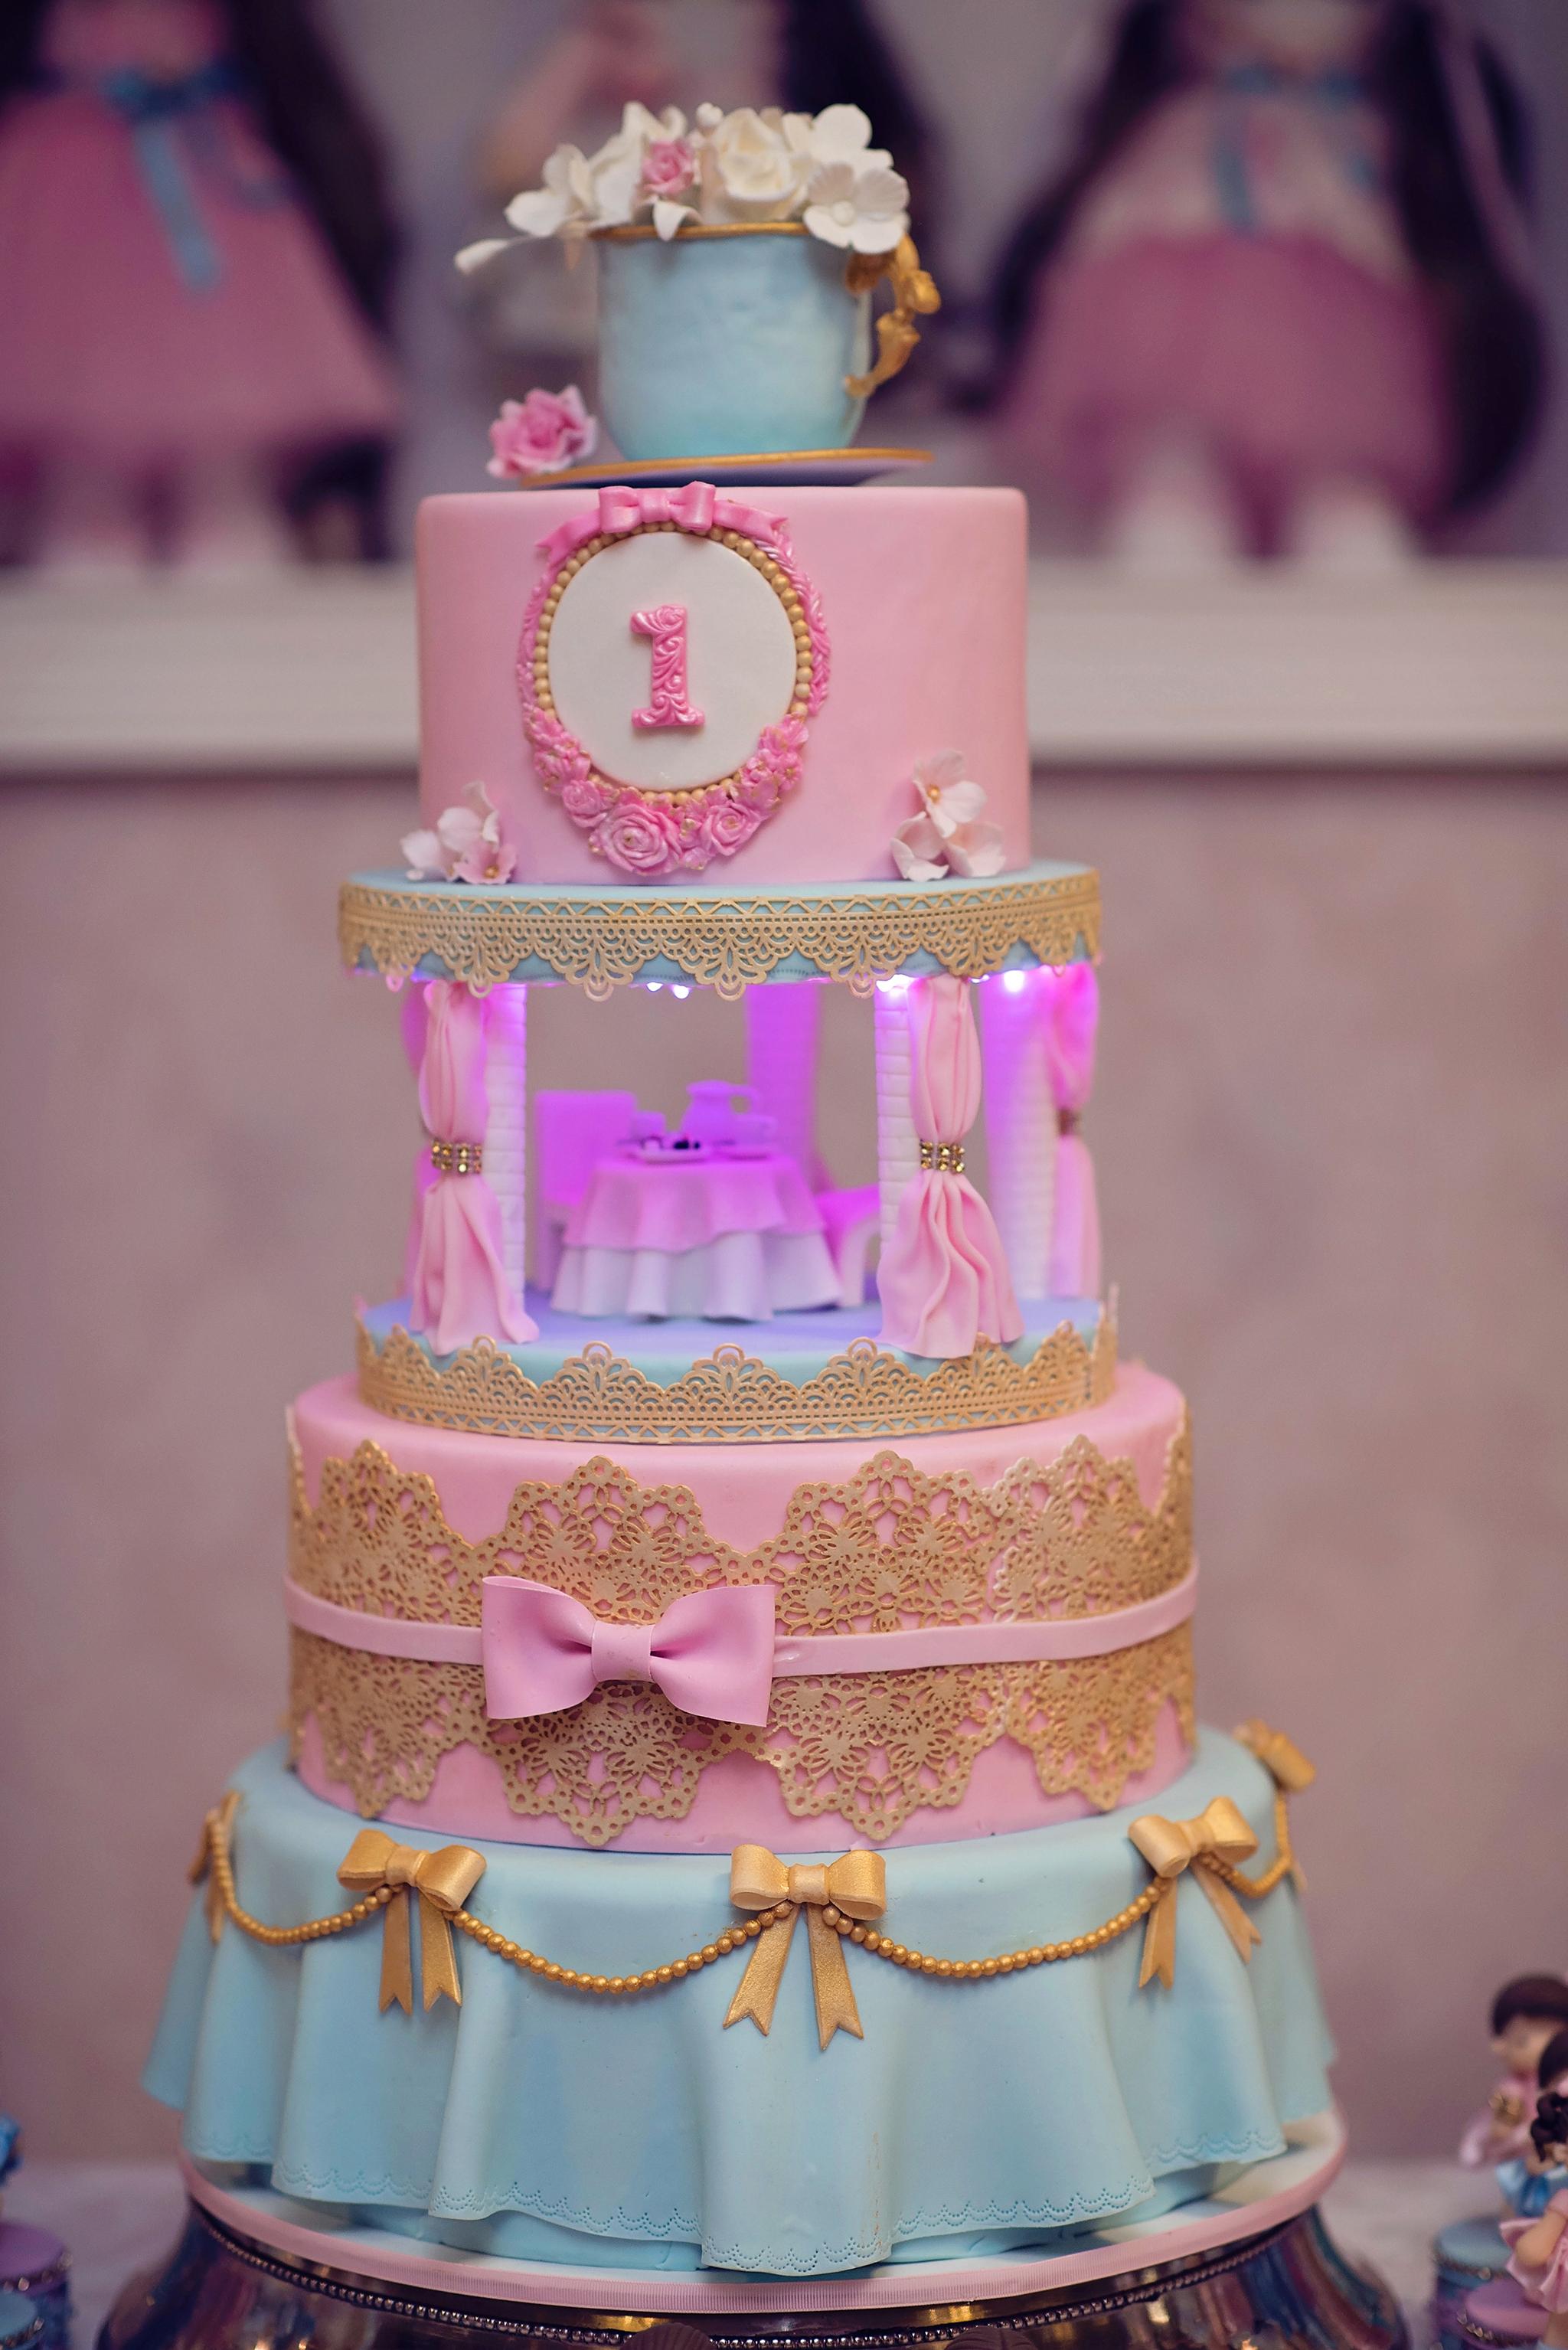 NJ-NY-cakesmash-birthday-Photographer-082.JPG